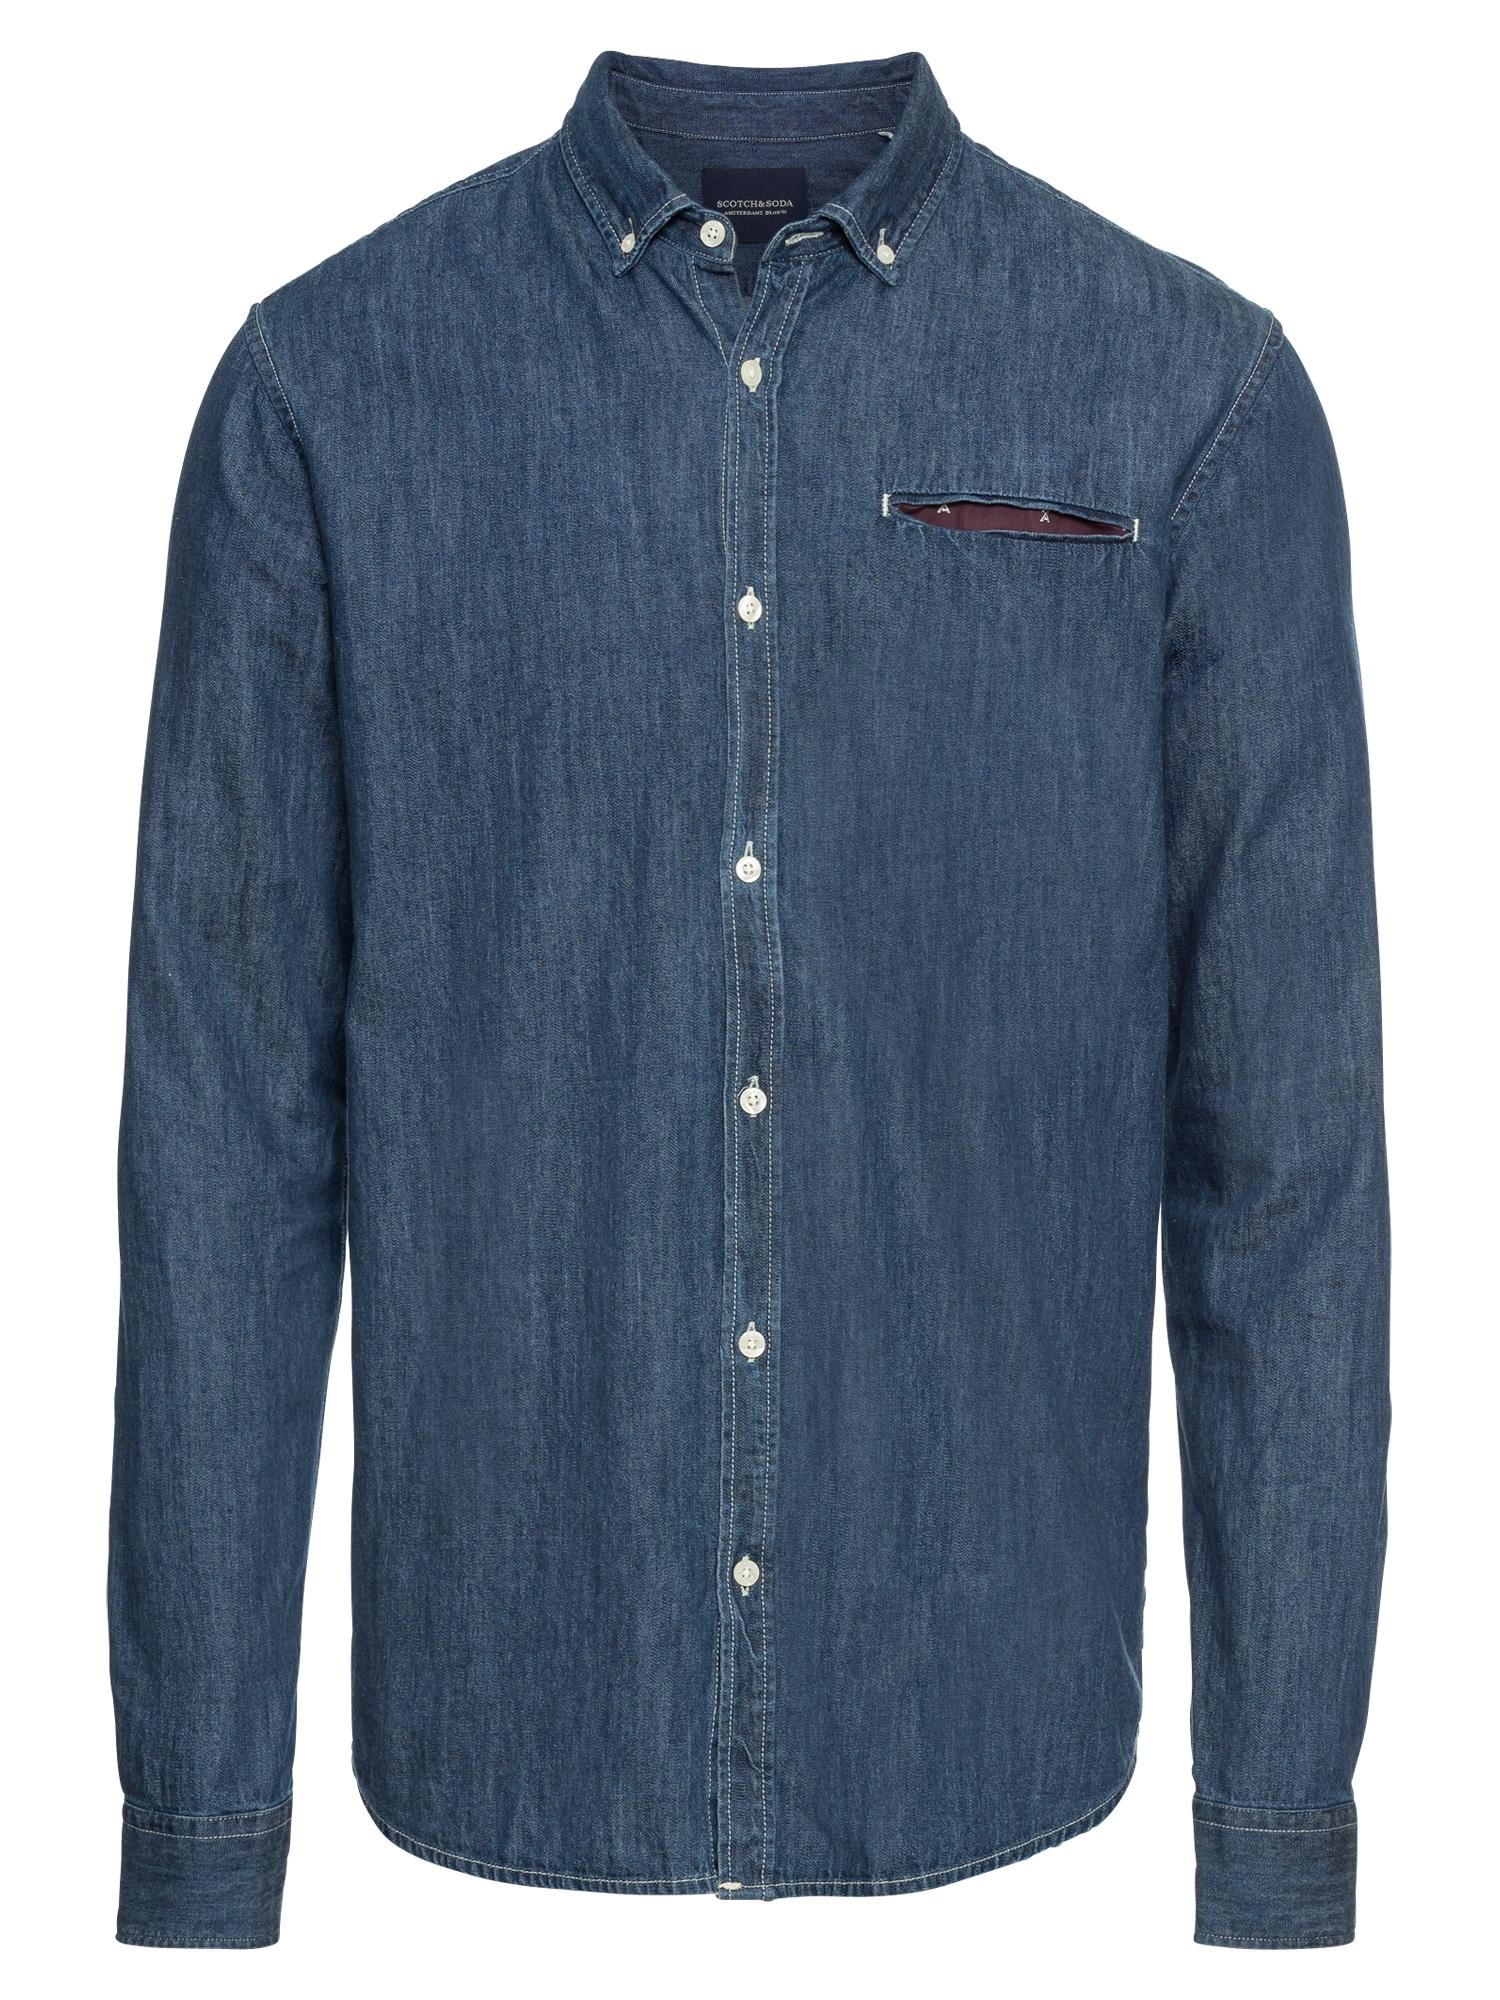 Košile REGULAR FIT 1 pocket clean denim shirt with pochet modrá SCOTCH & SODA